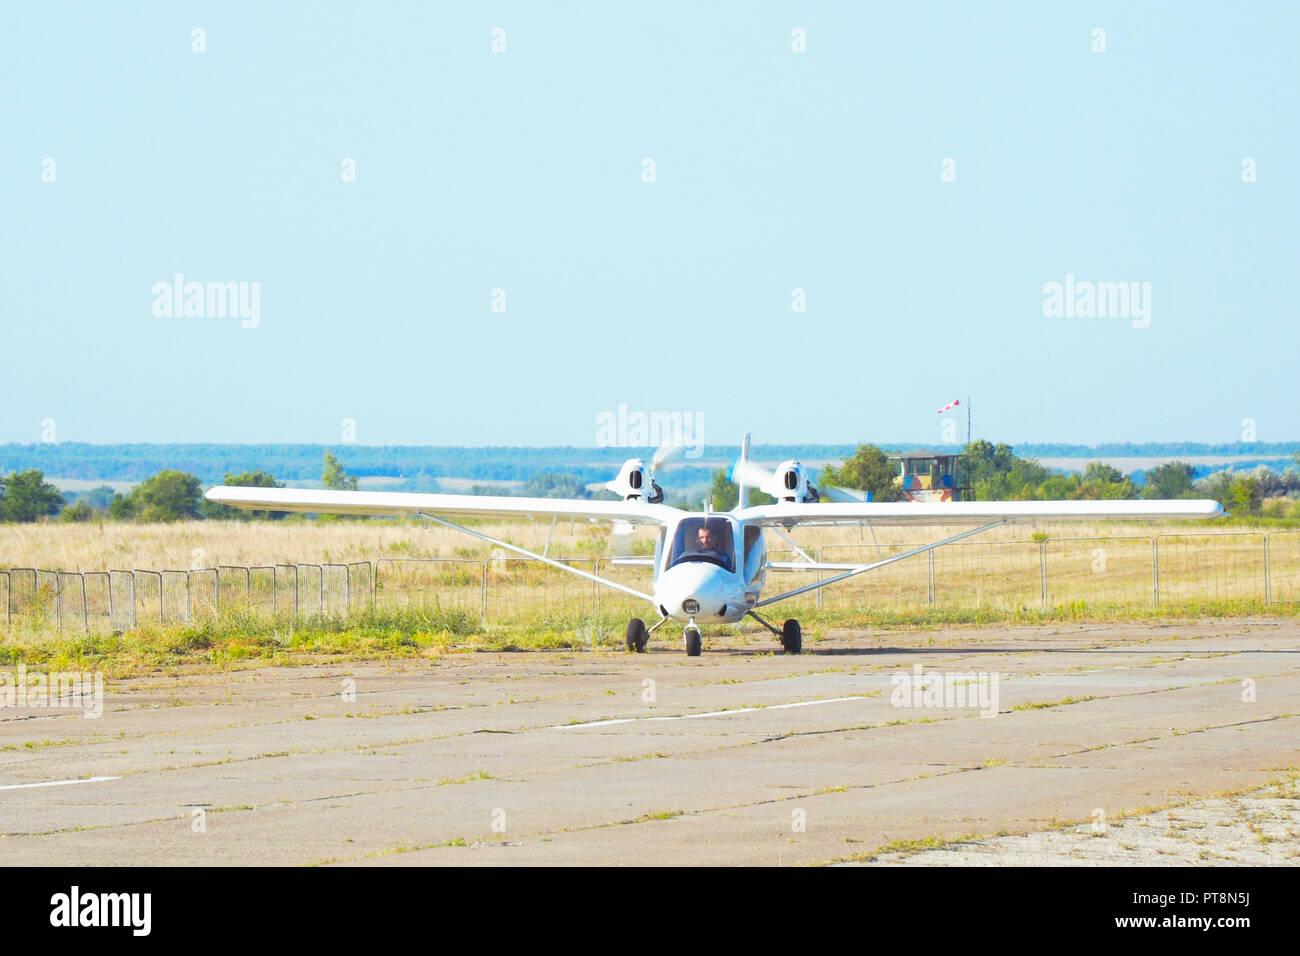 Light plane on the runway - Stock Image